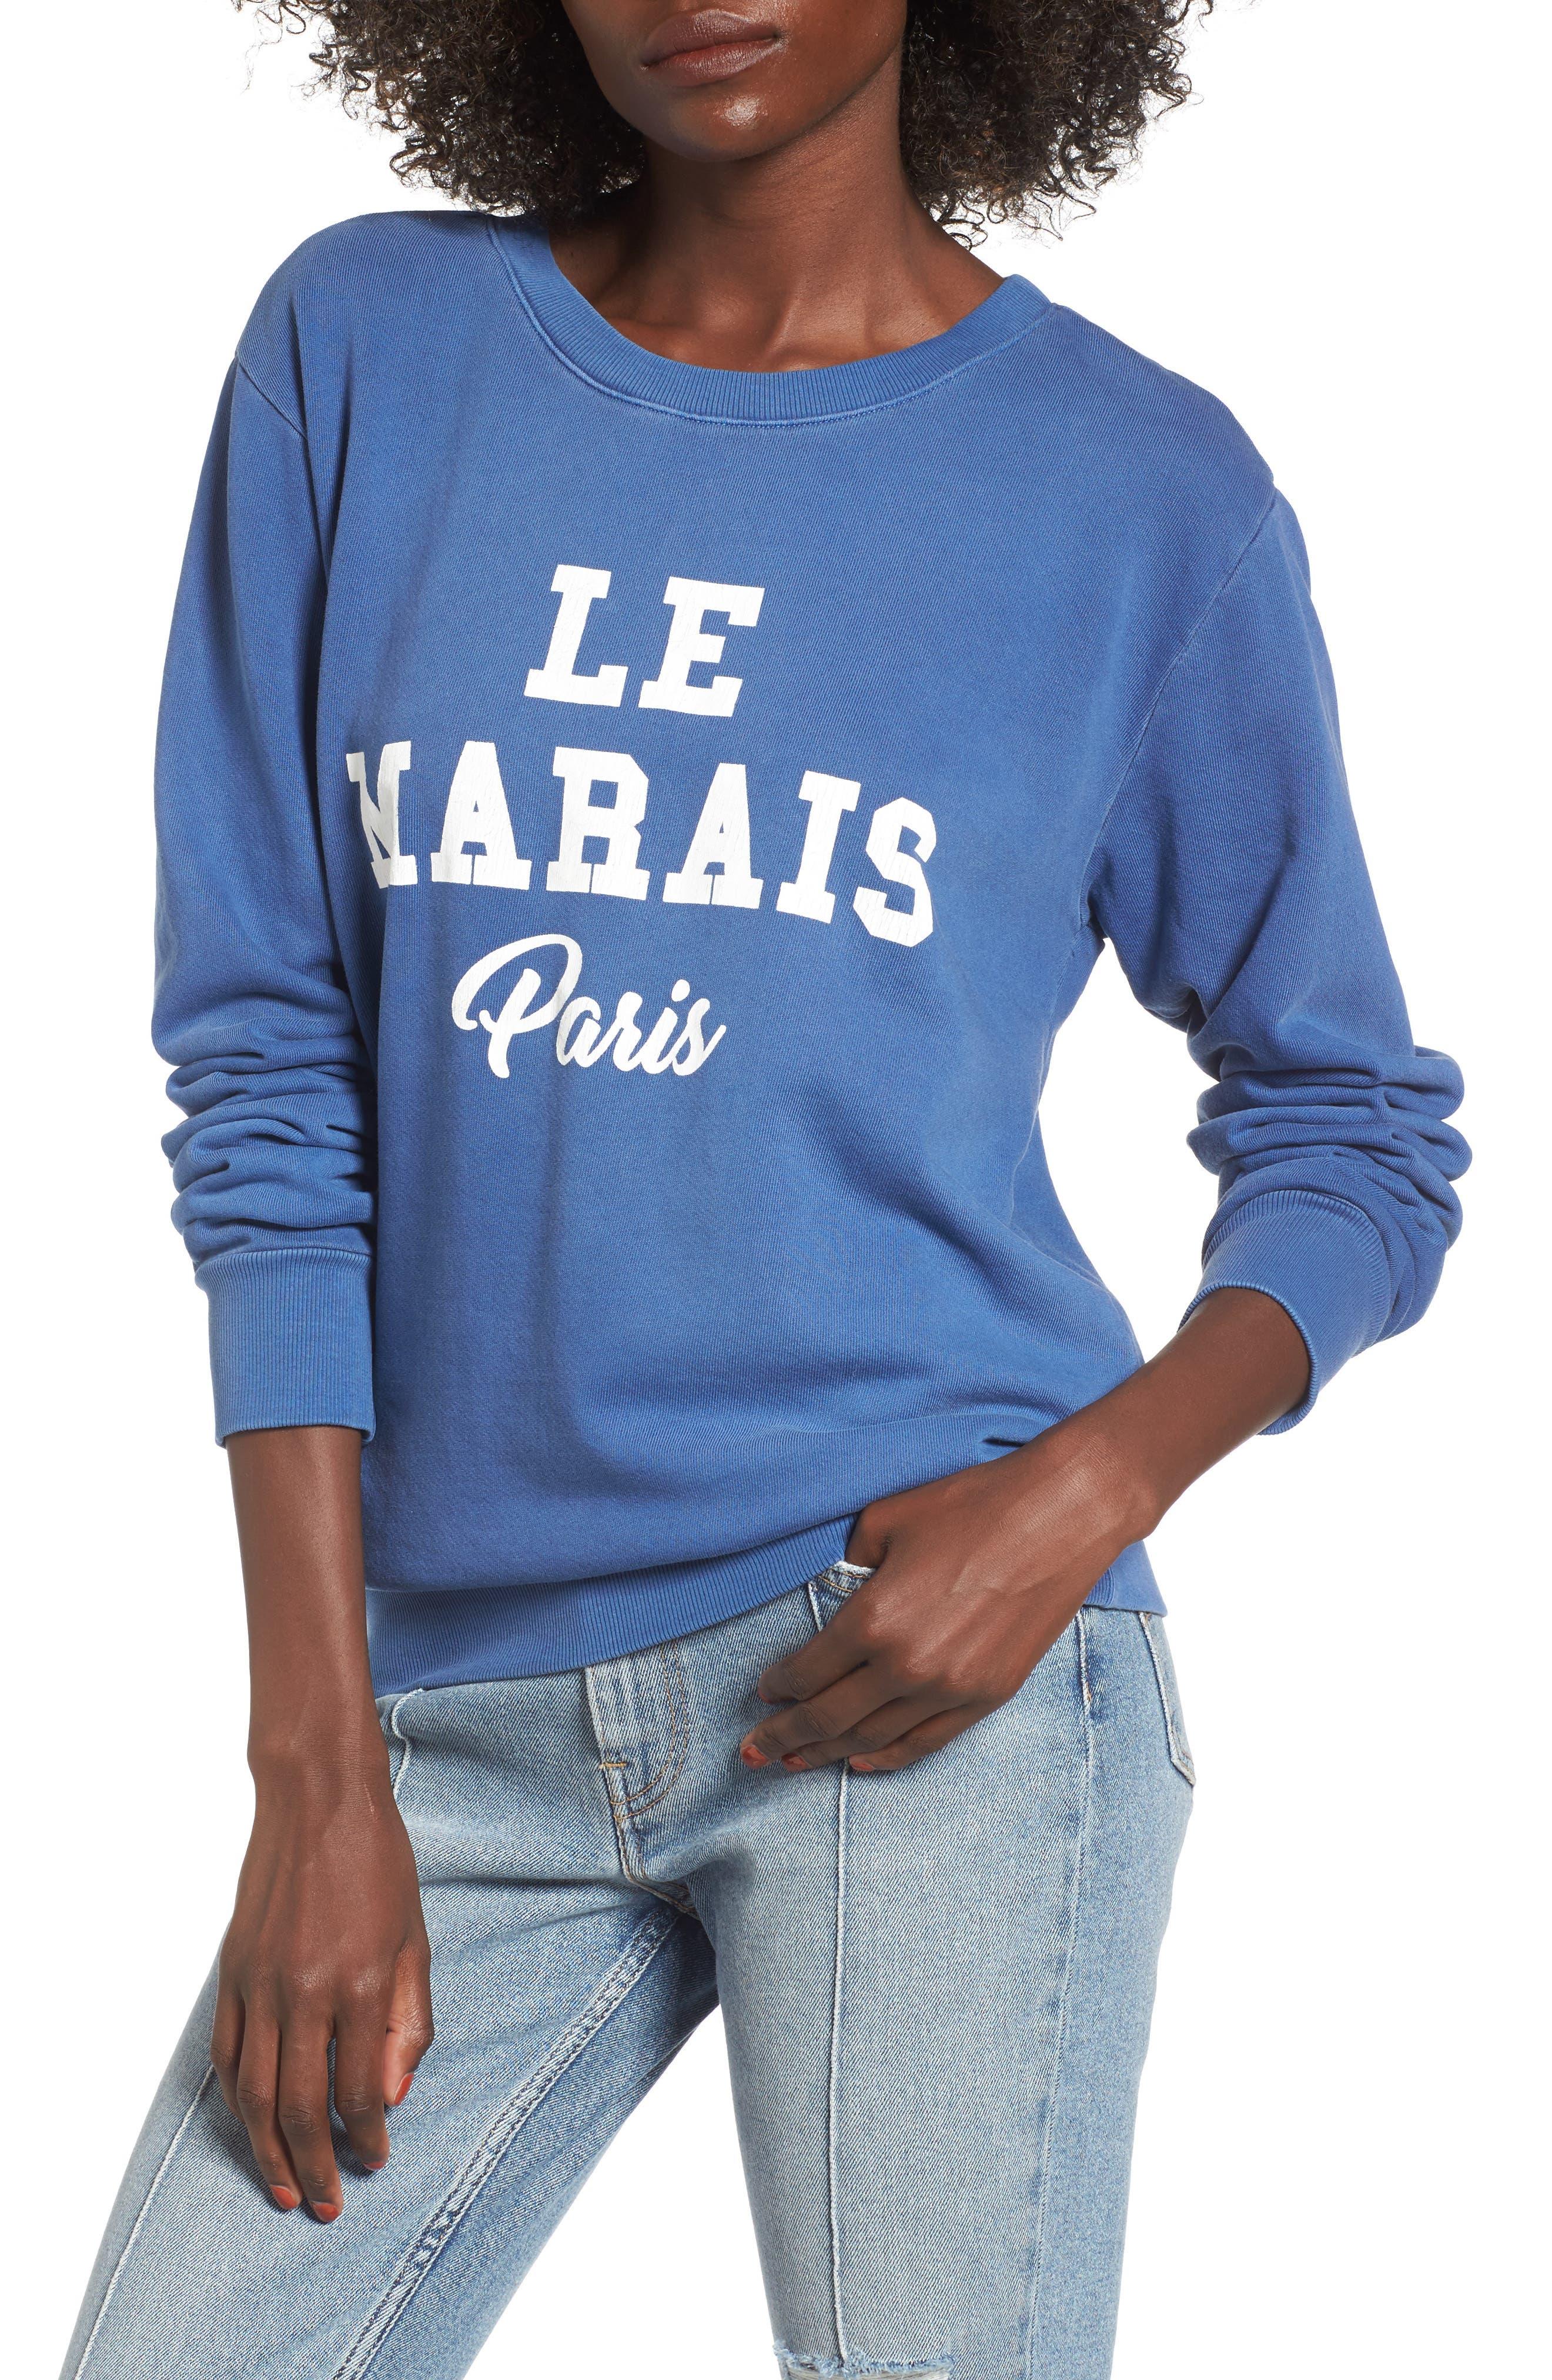 DAYDREAMER Le Marais Paris Graphic Sweatshirt